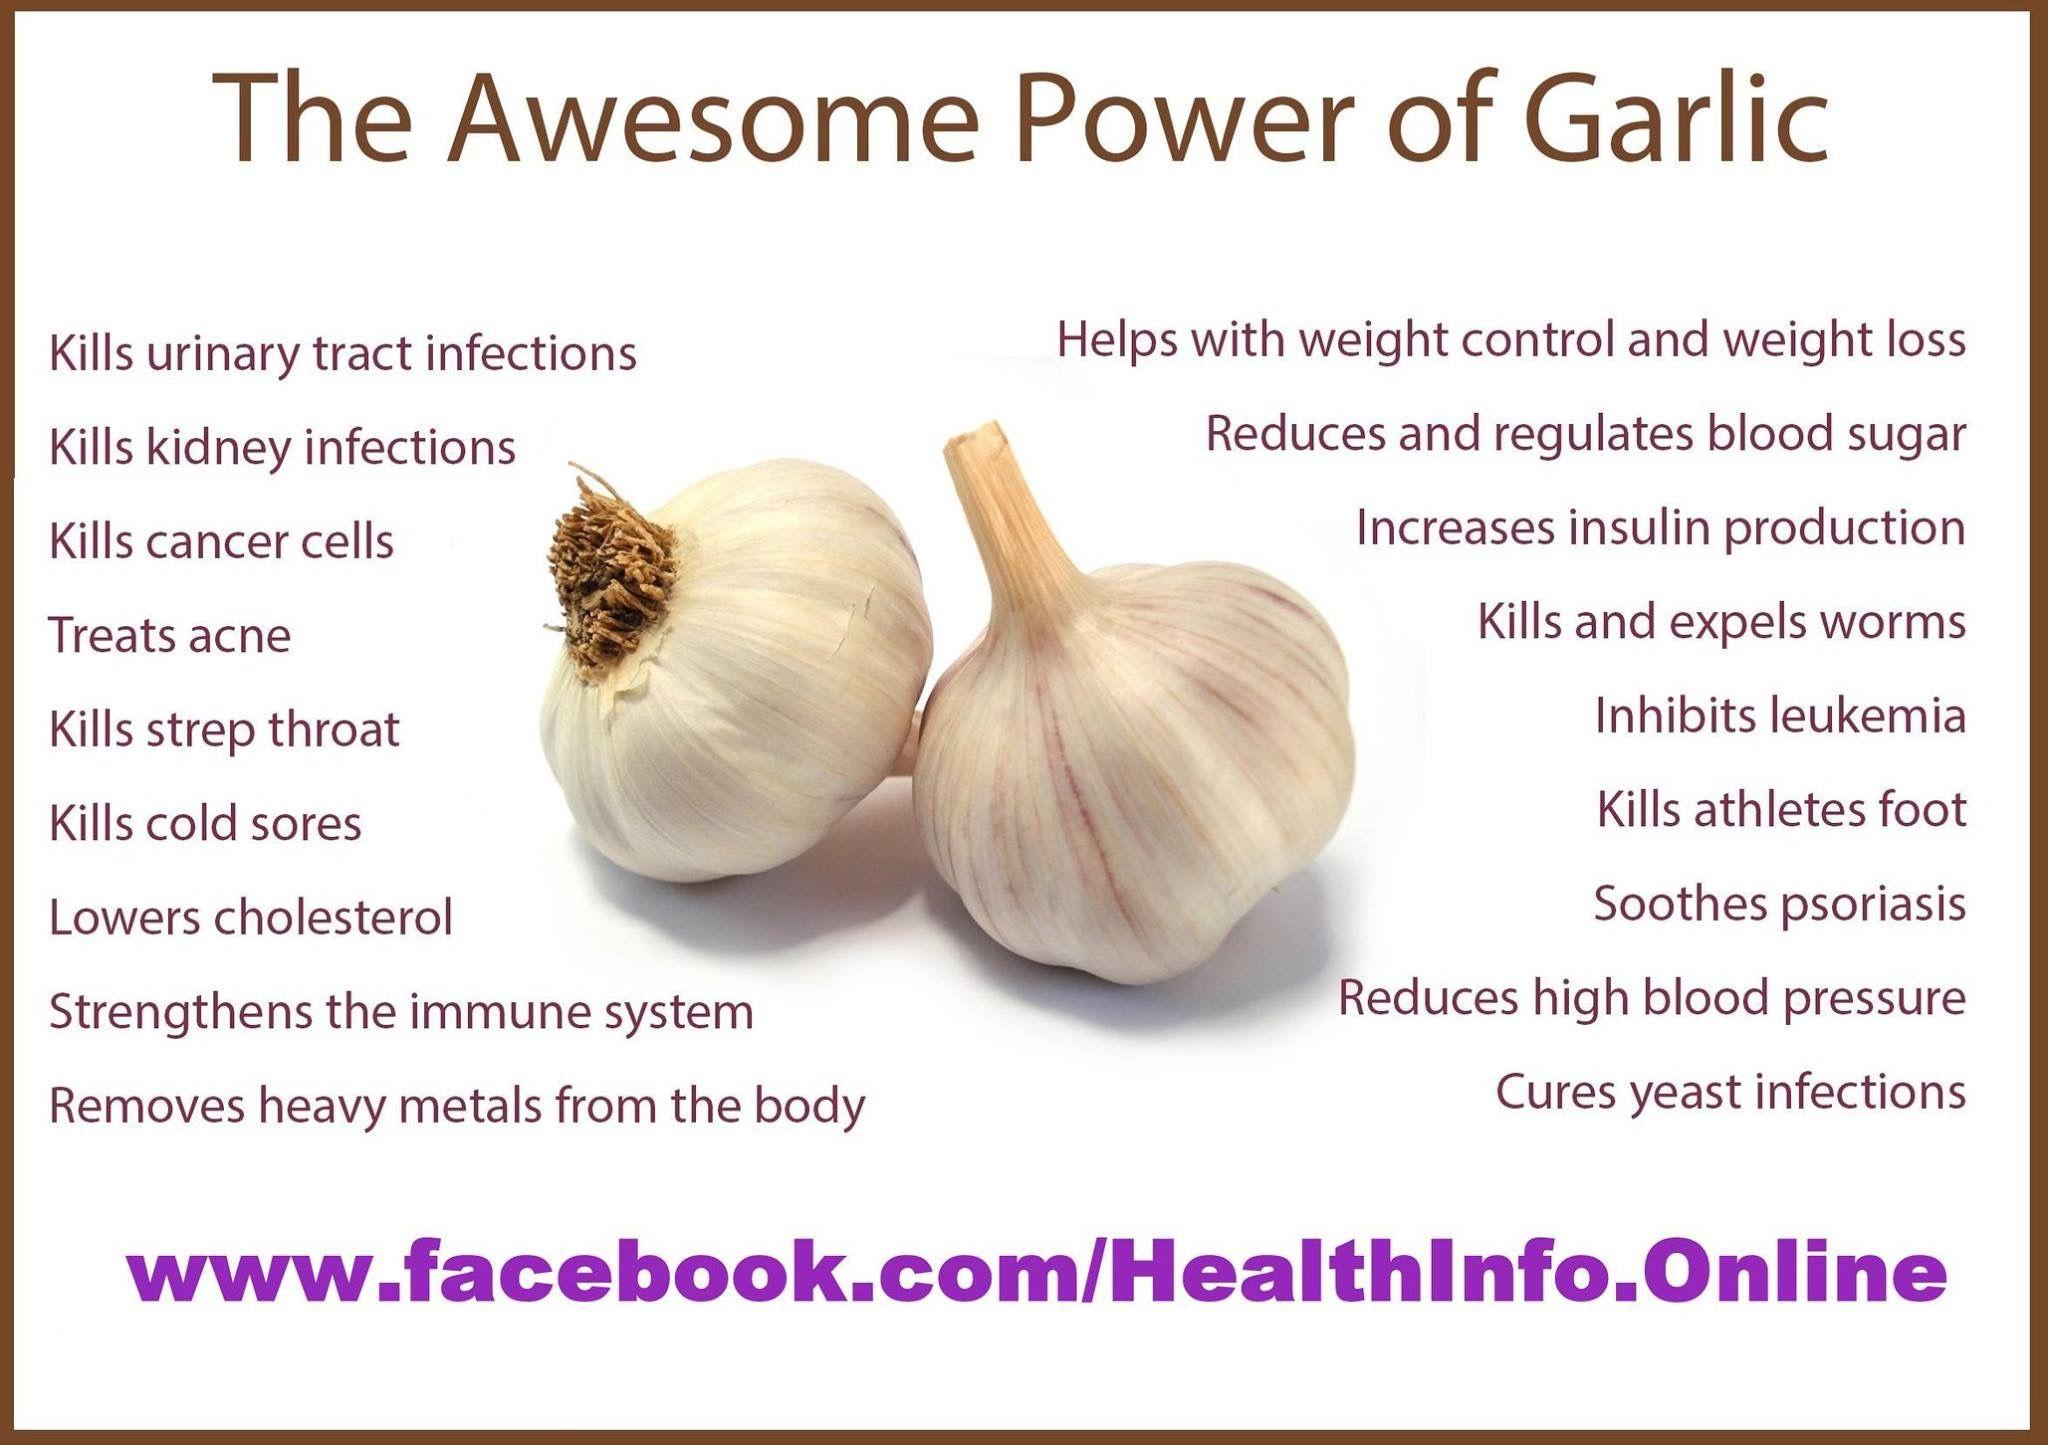 pinnirmal shukla on health | garlic health benefits